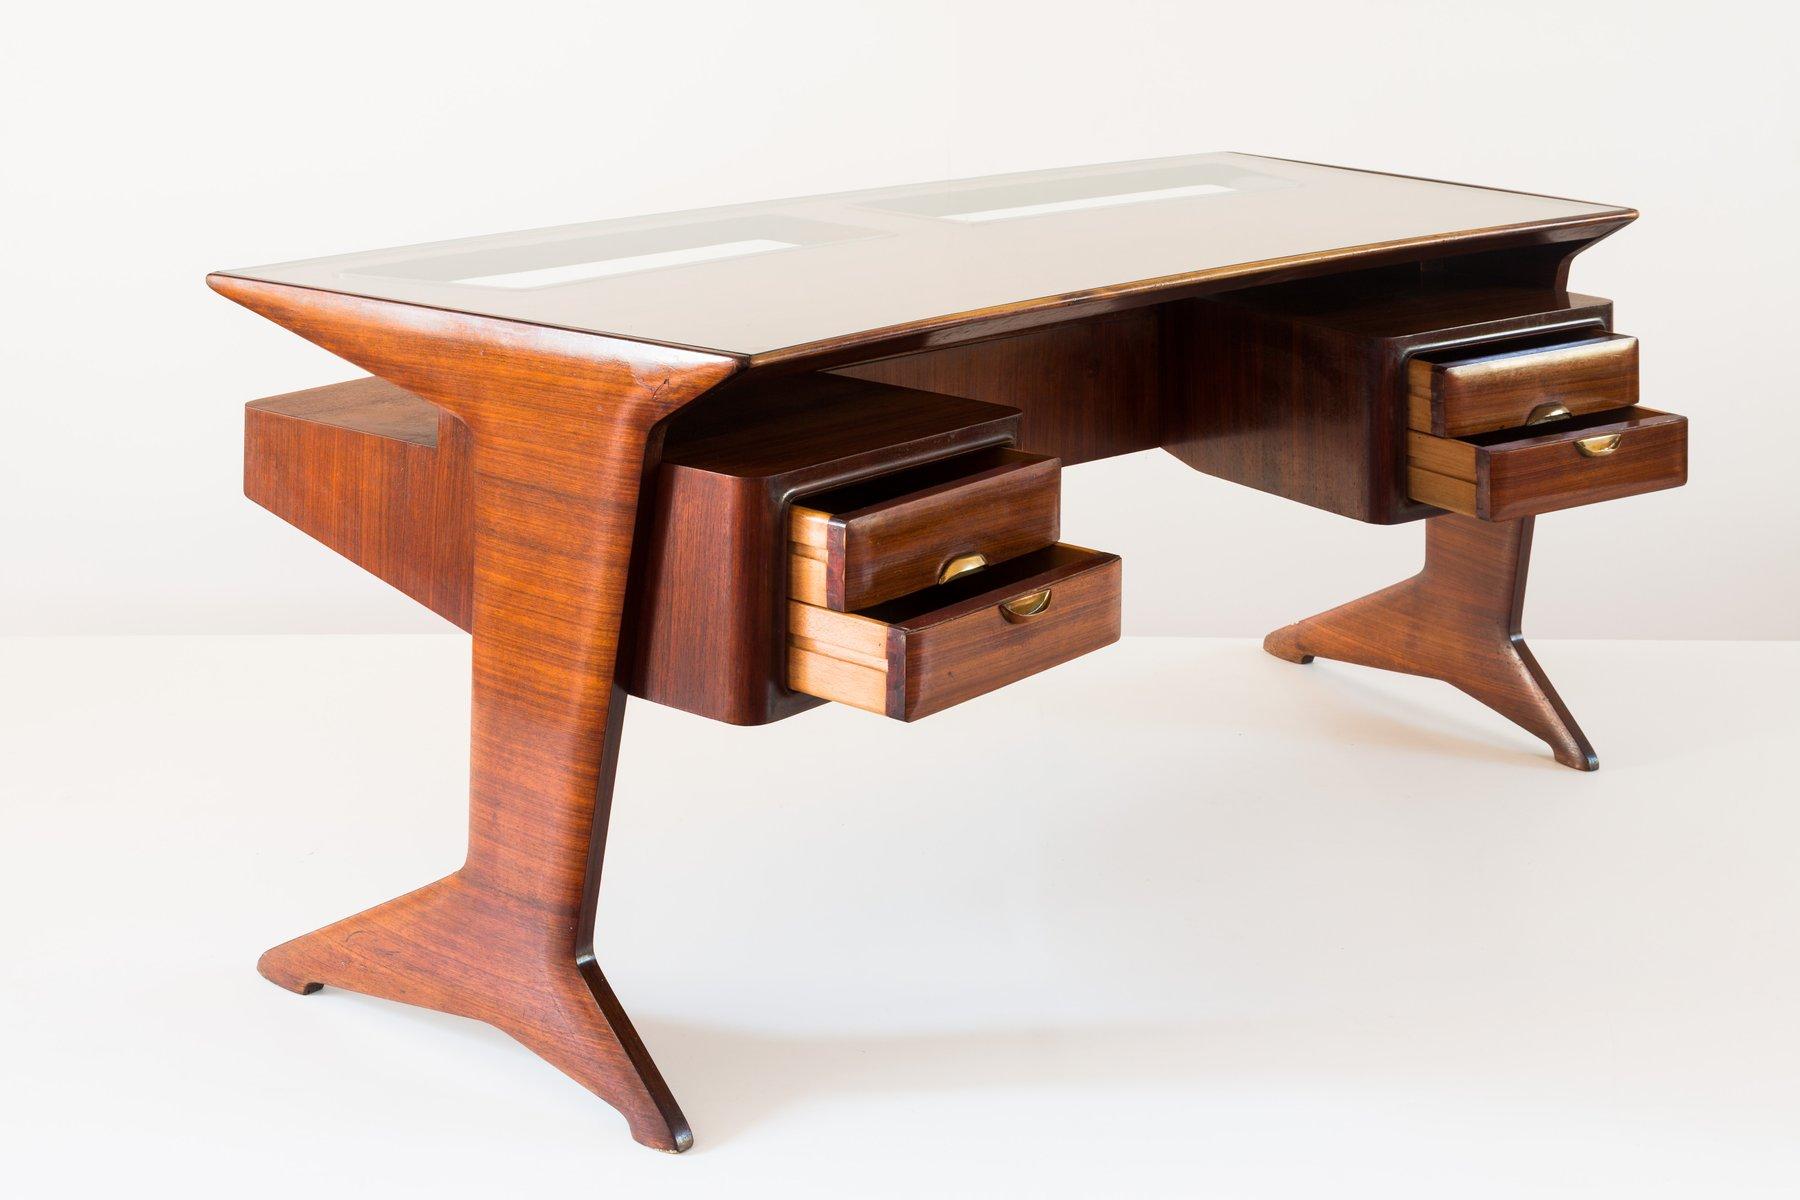 bureau de guglielmo ulrich 1940s en vente sur pamono. Black Bedroom Furniture Sets. Home Design Ideas